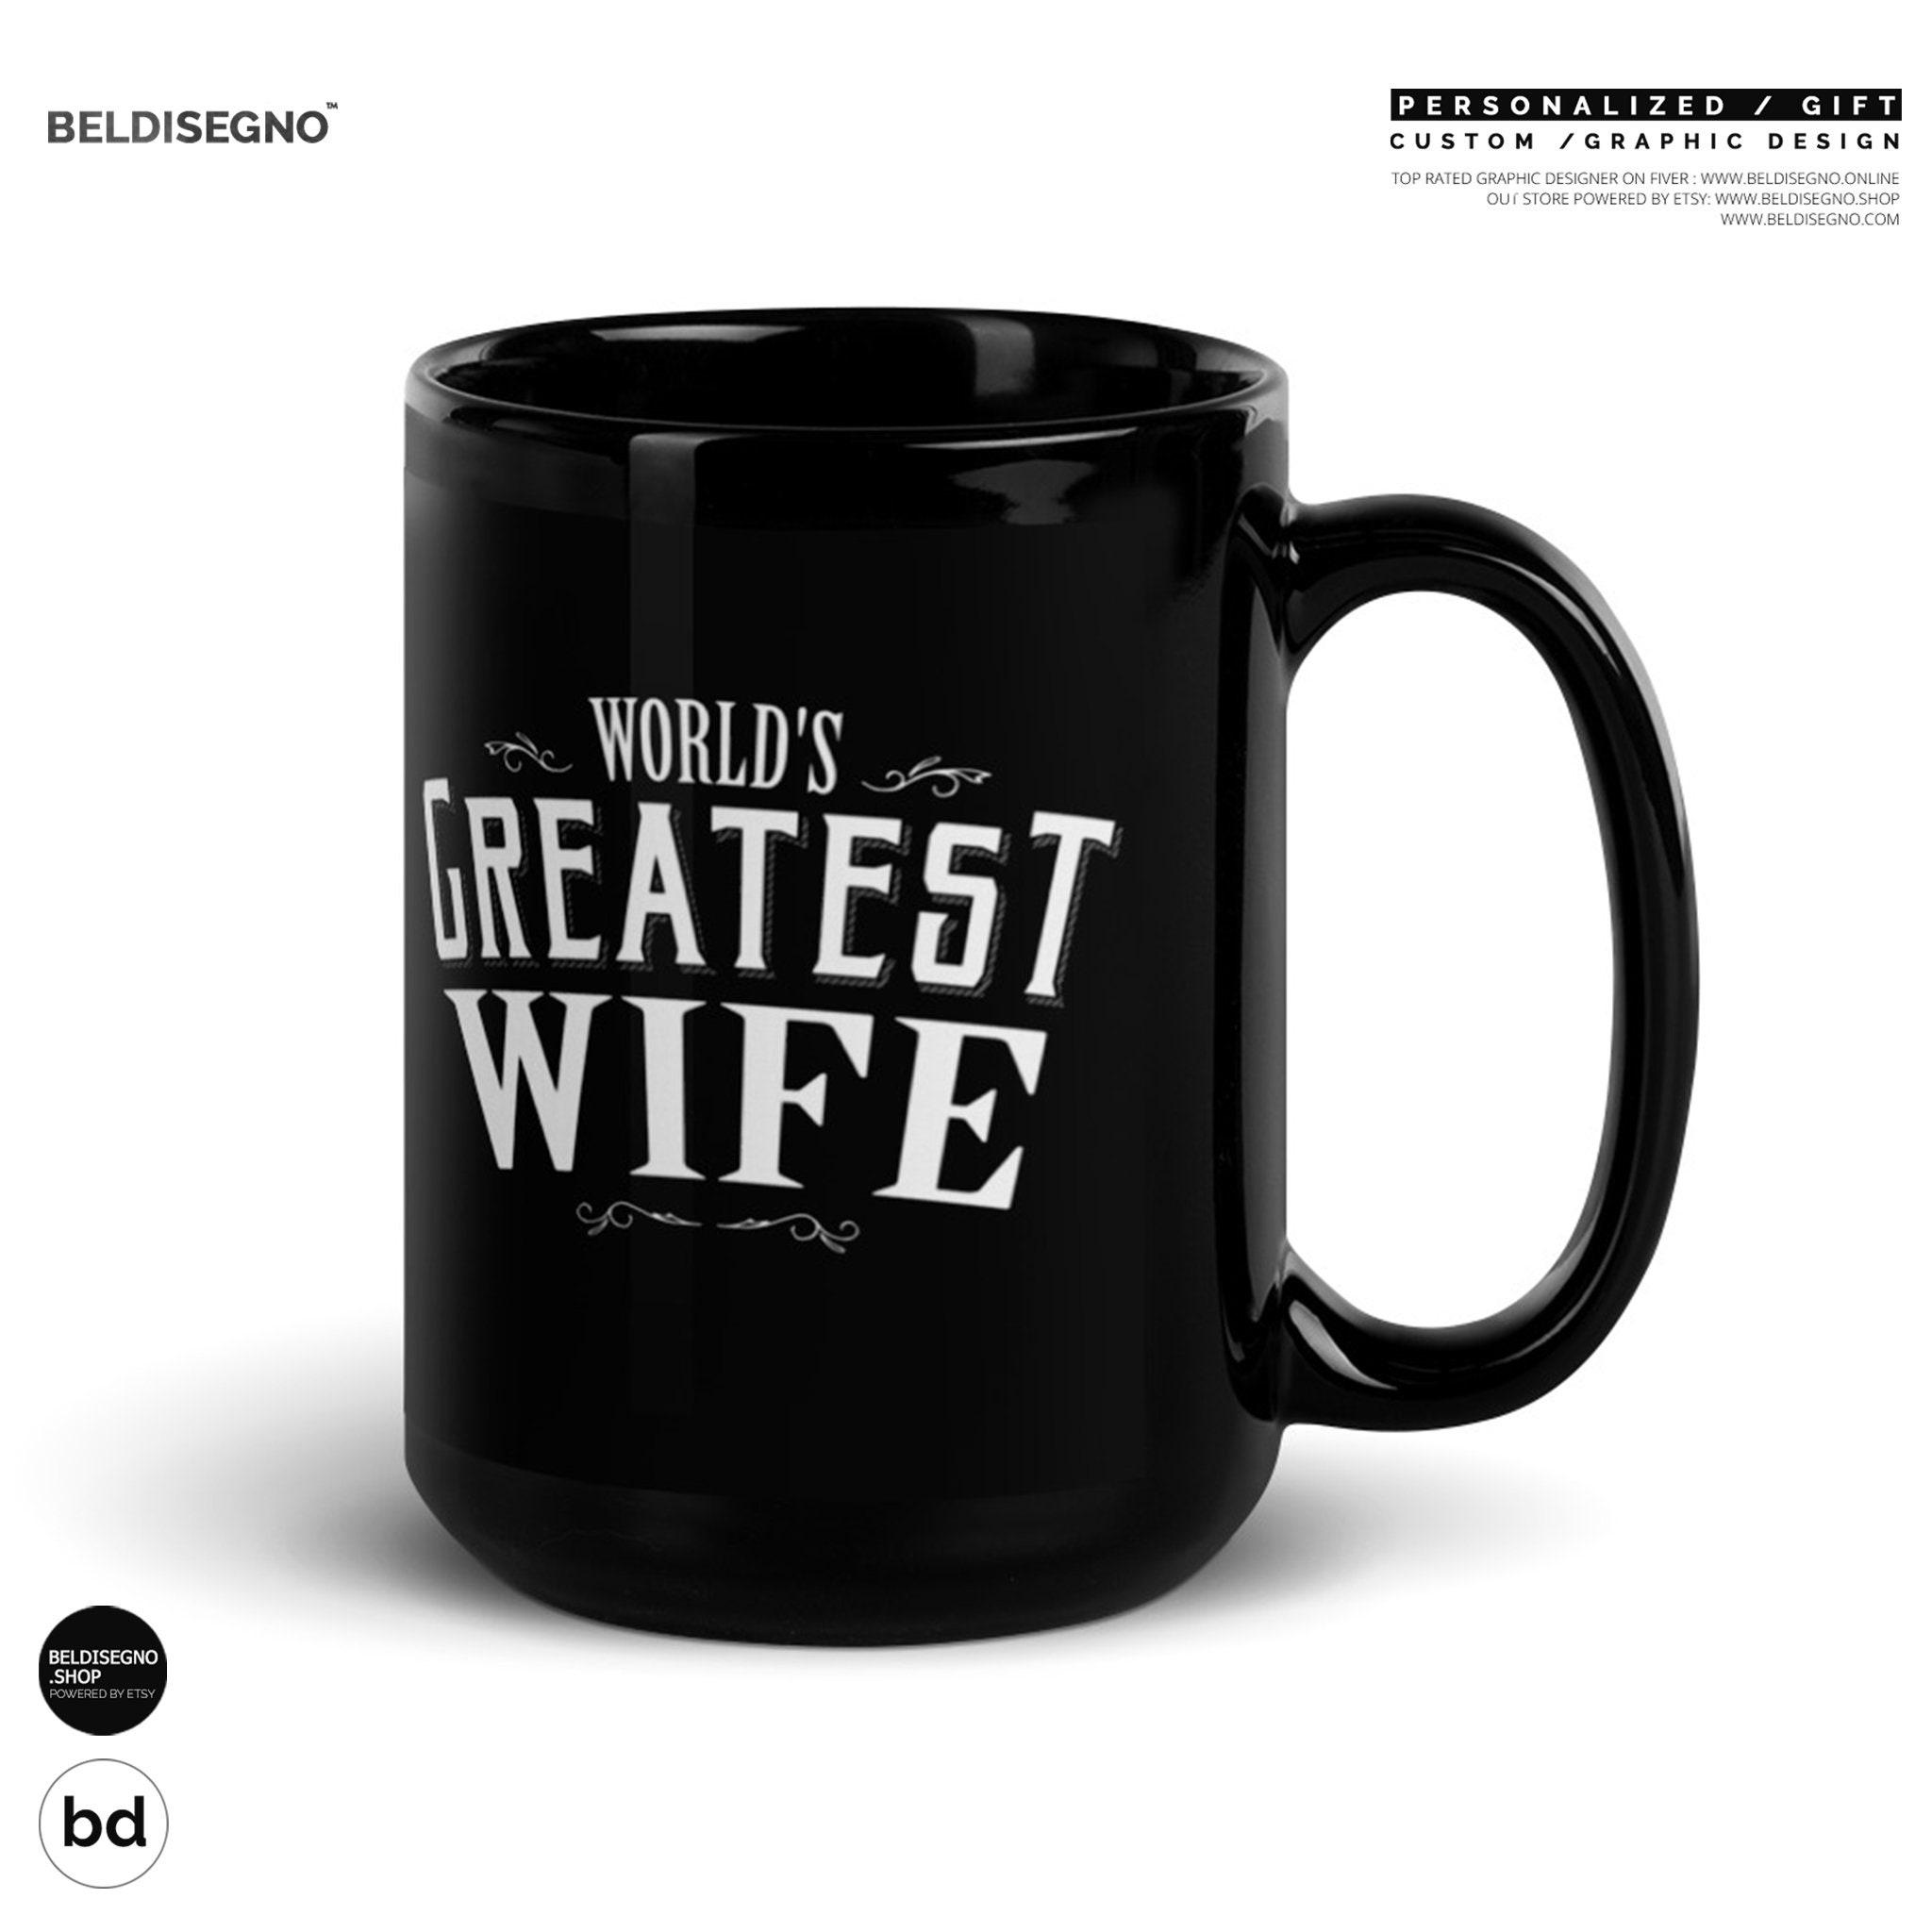 World S Greatest Wife Coffee Mug Wife Christmas Gift Wife Christmas Wife Birthday Wife Gift Idea Wife Coffee Mug Wife Gift Christmas